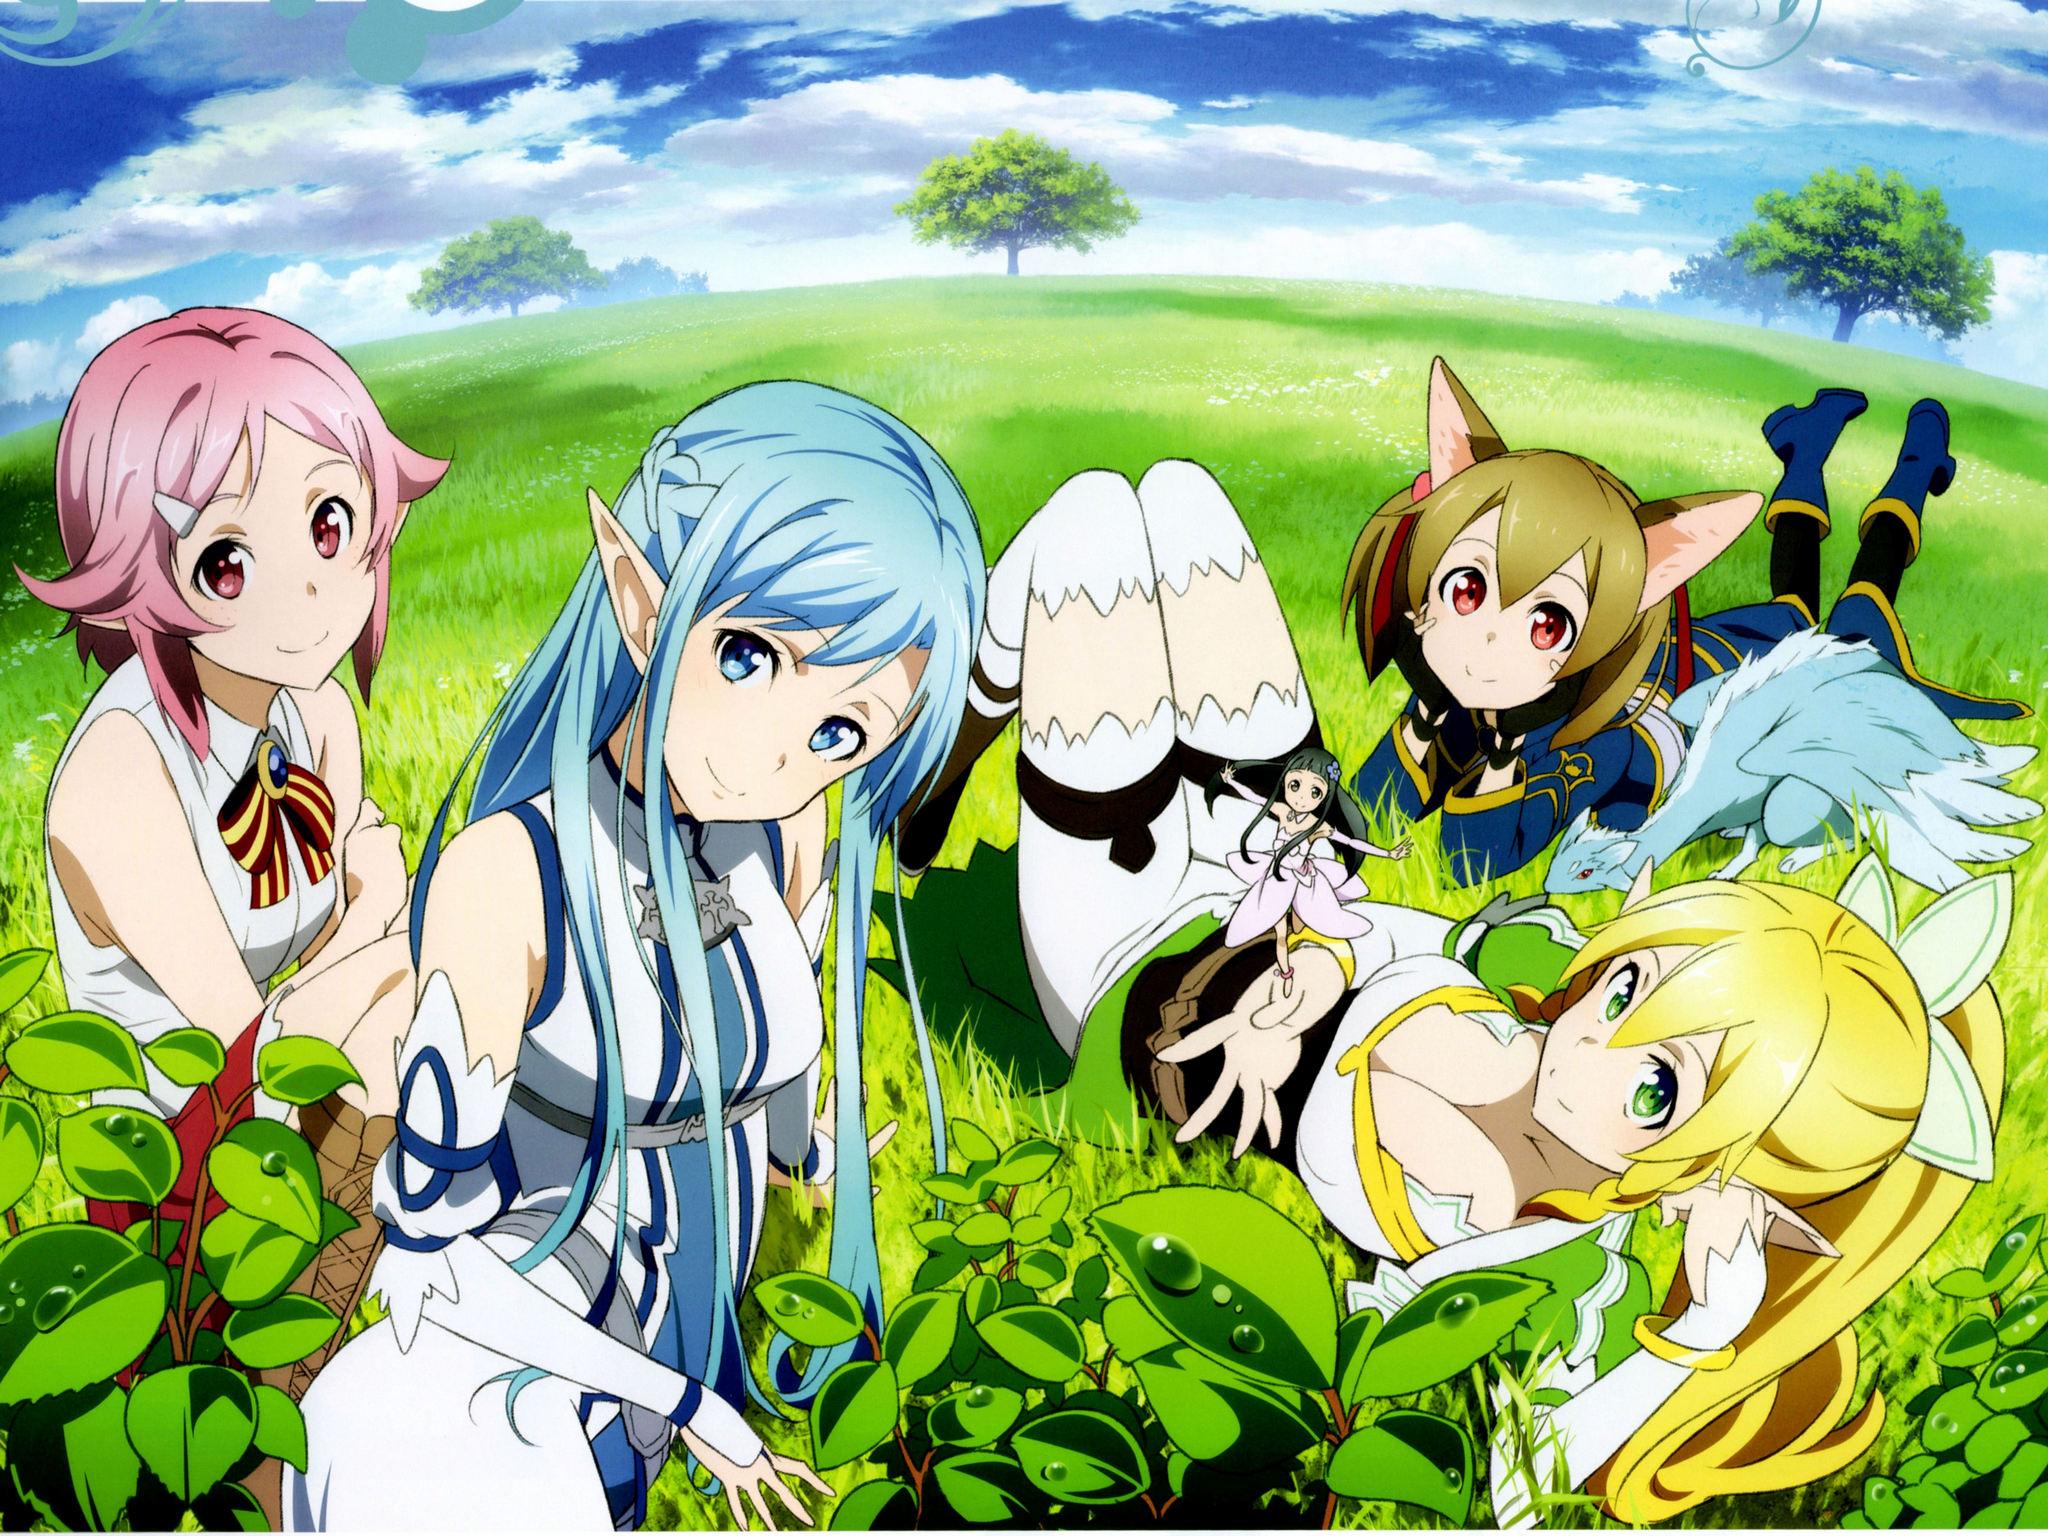 Wallpaper Sword Art Online Girls